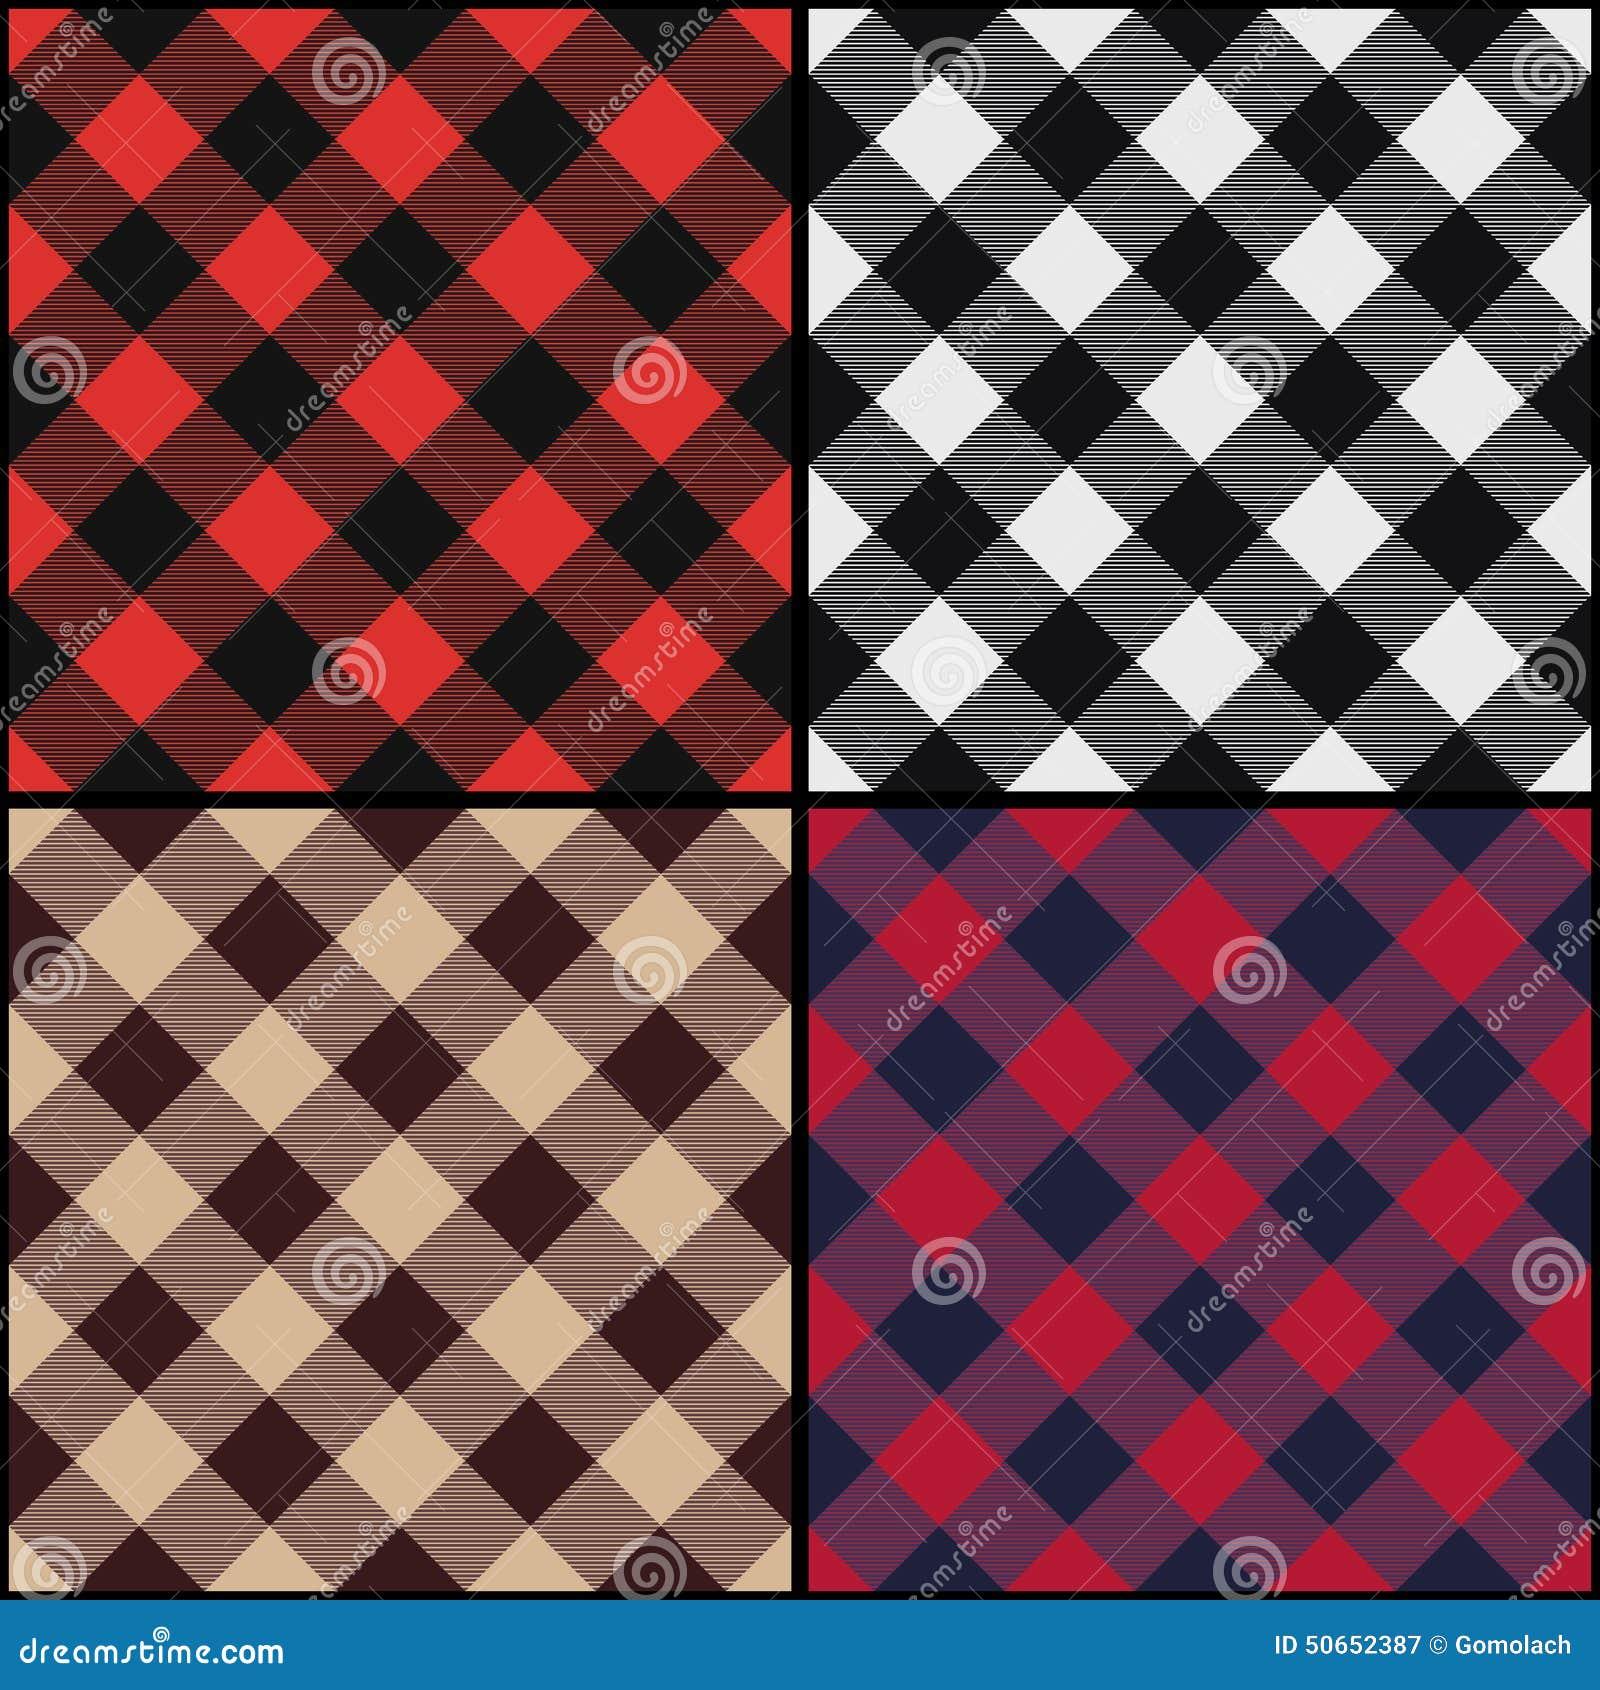 Diagonale naadloze het patroonreeks van de houthakkersplaid